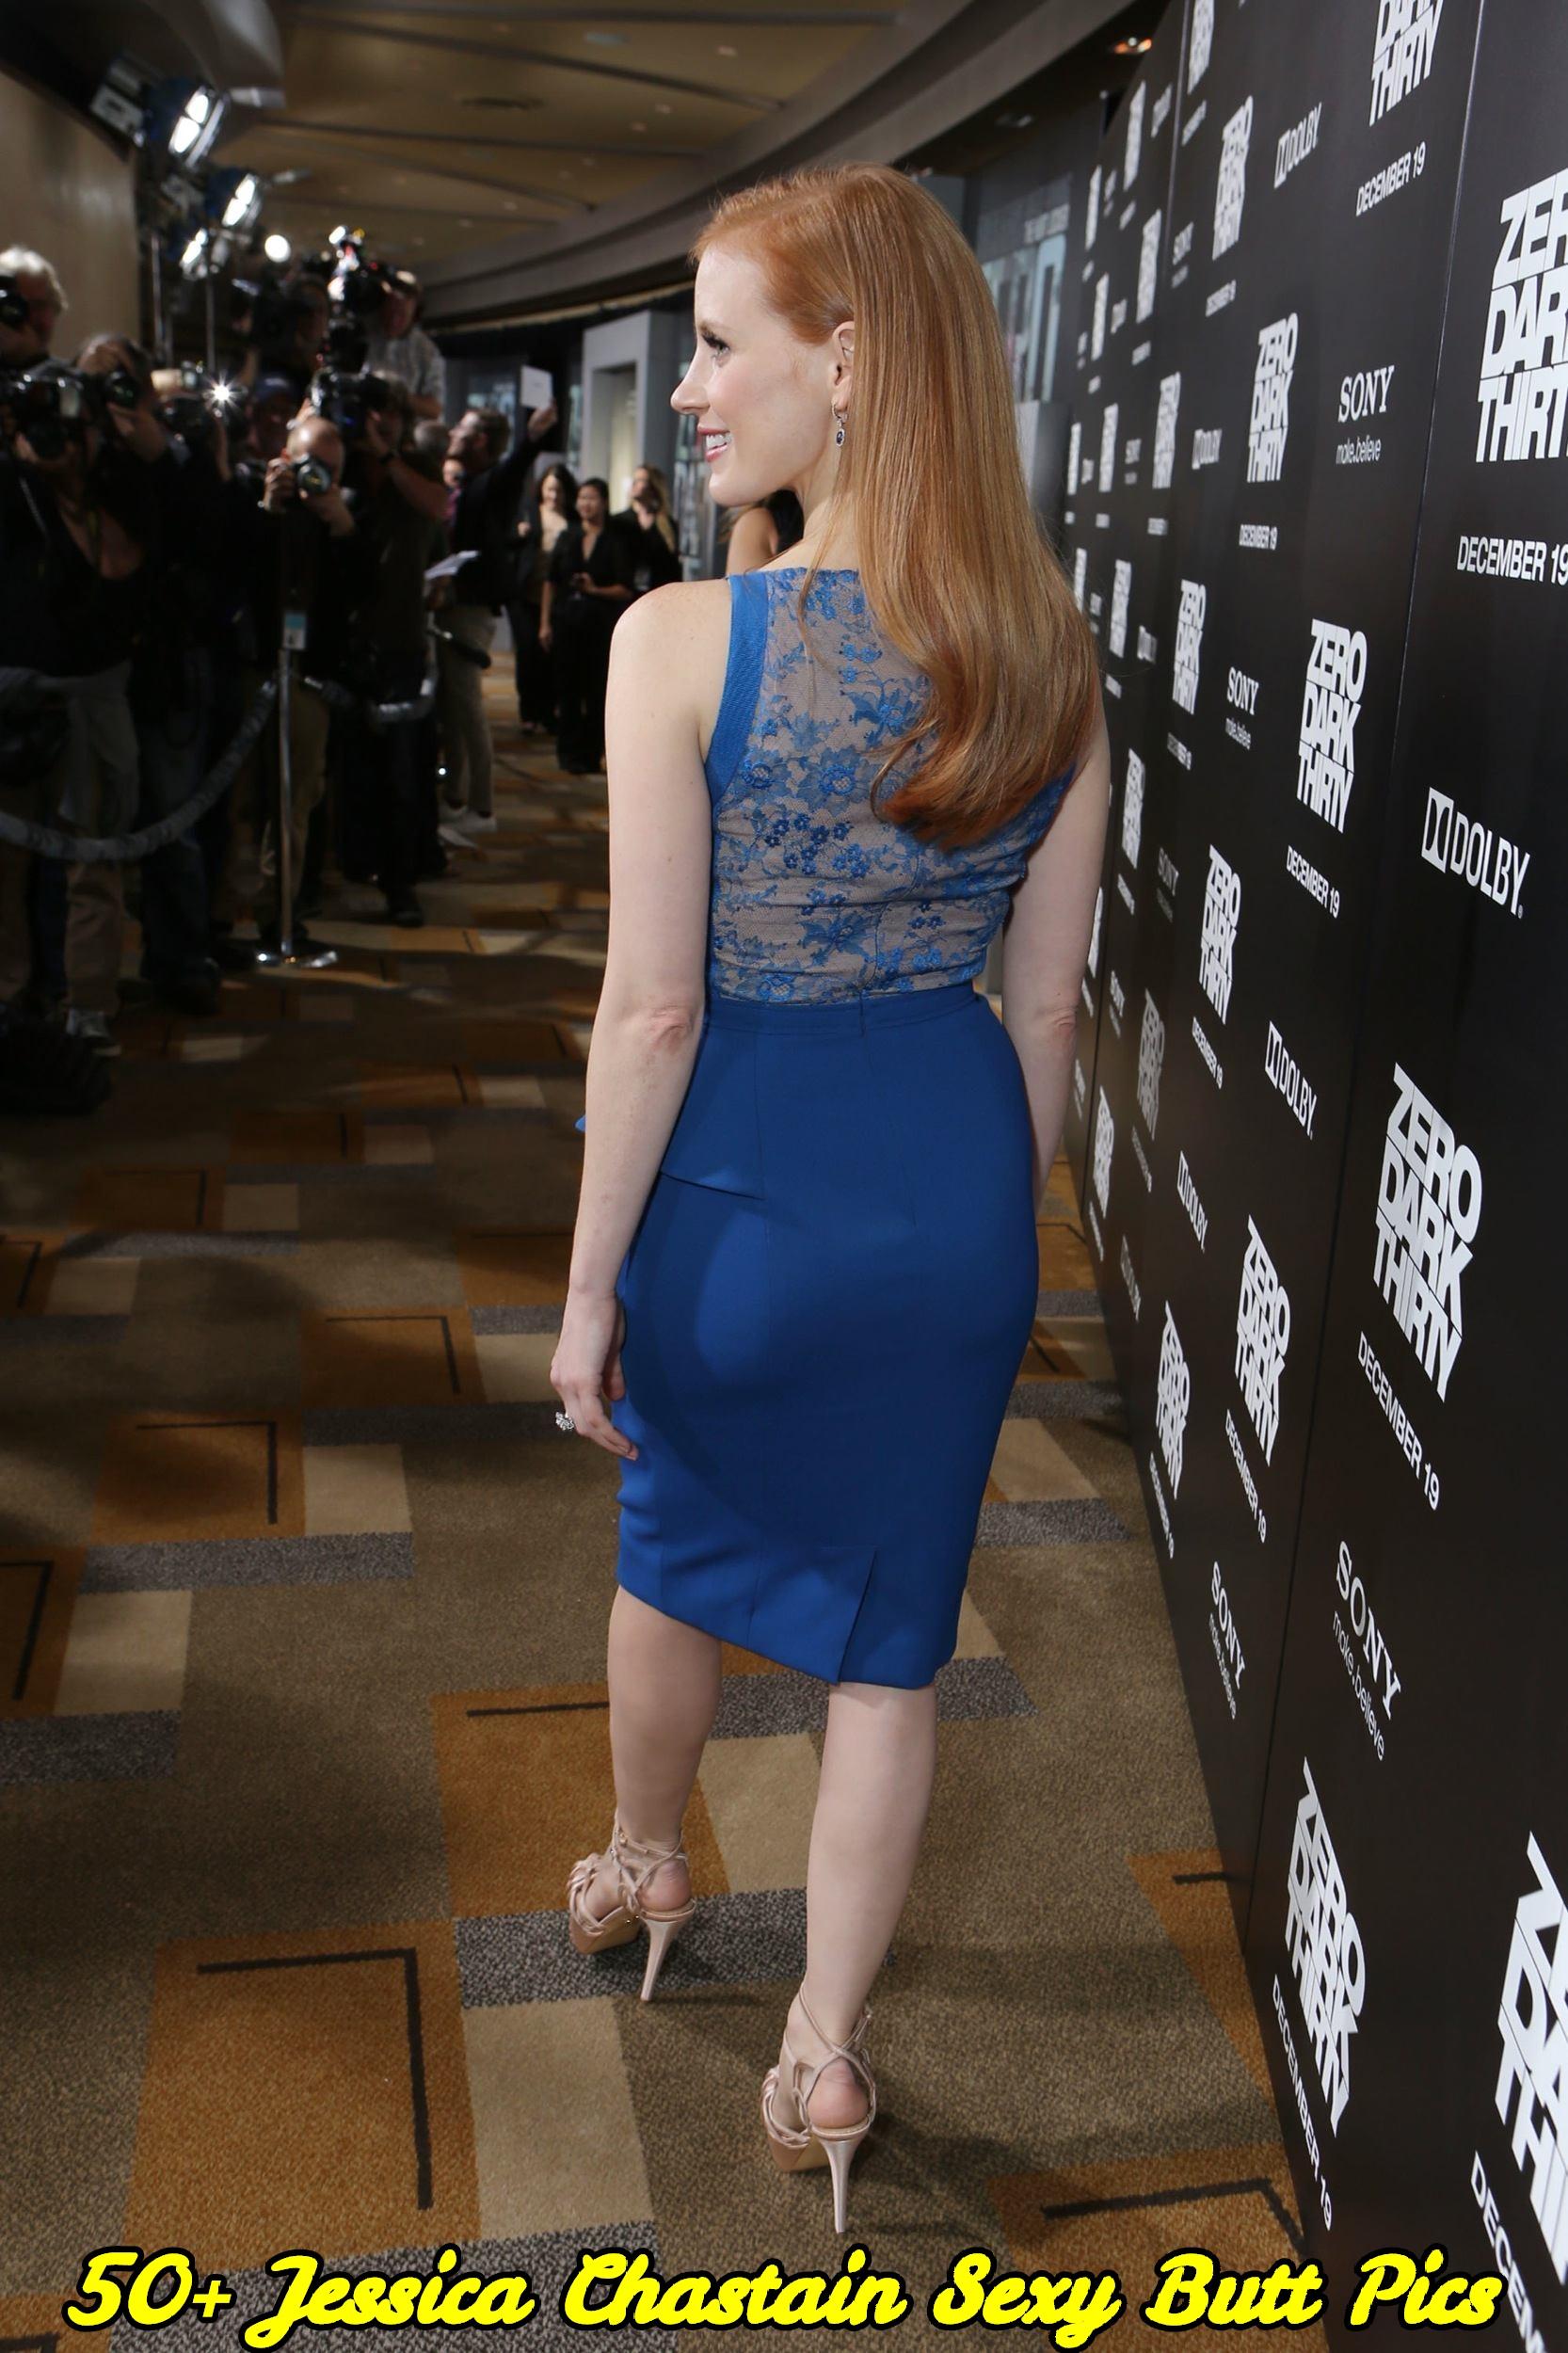 Jessica Chastain sexy butt pics